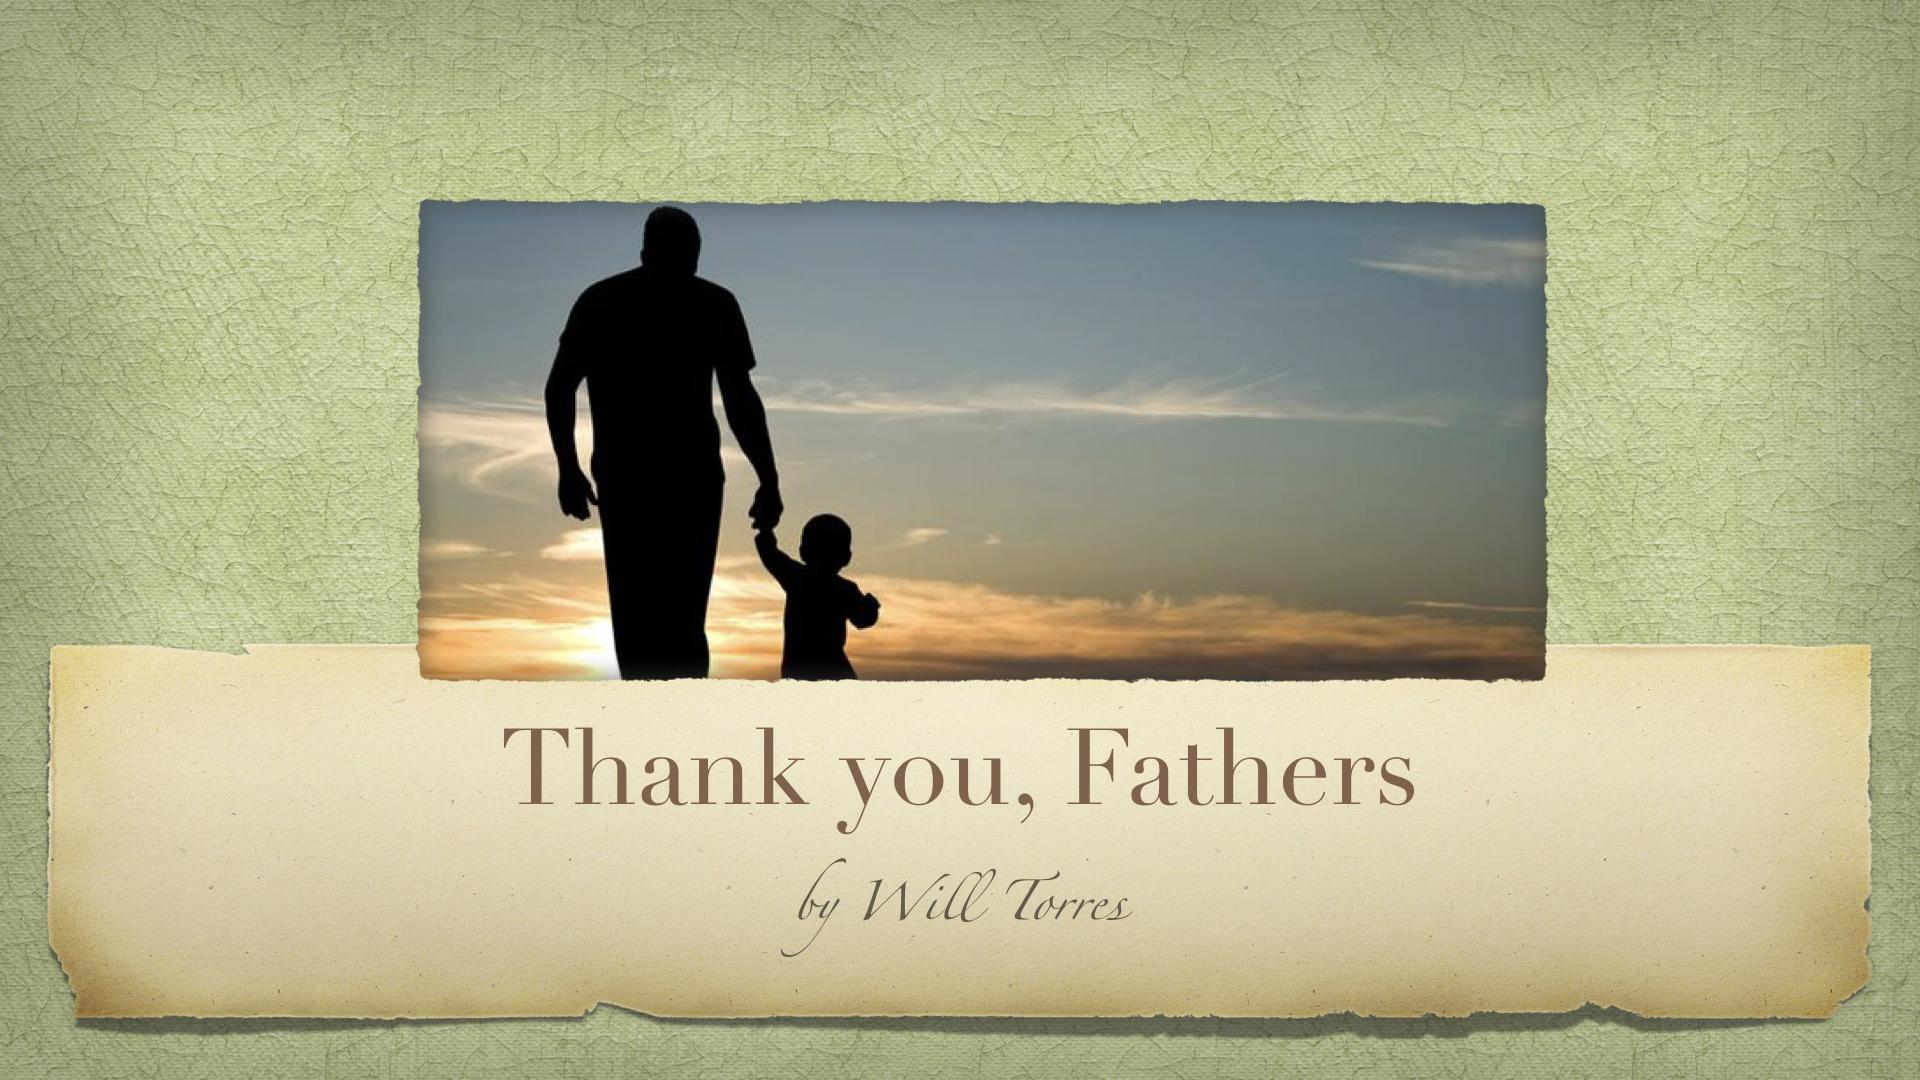 2018-06-17-Thank-You-Fathers.jpeg